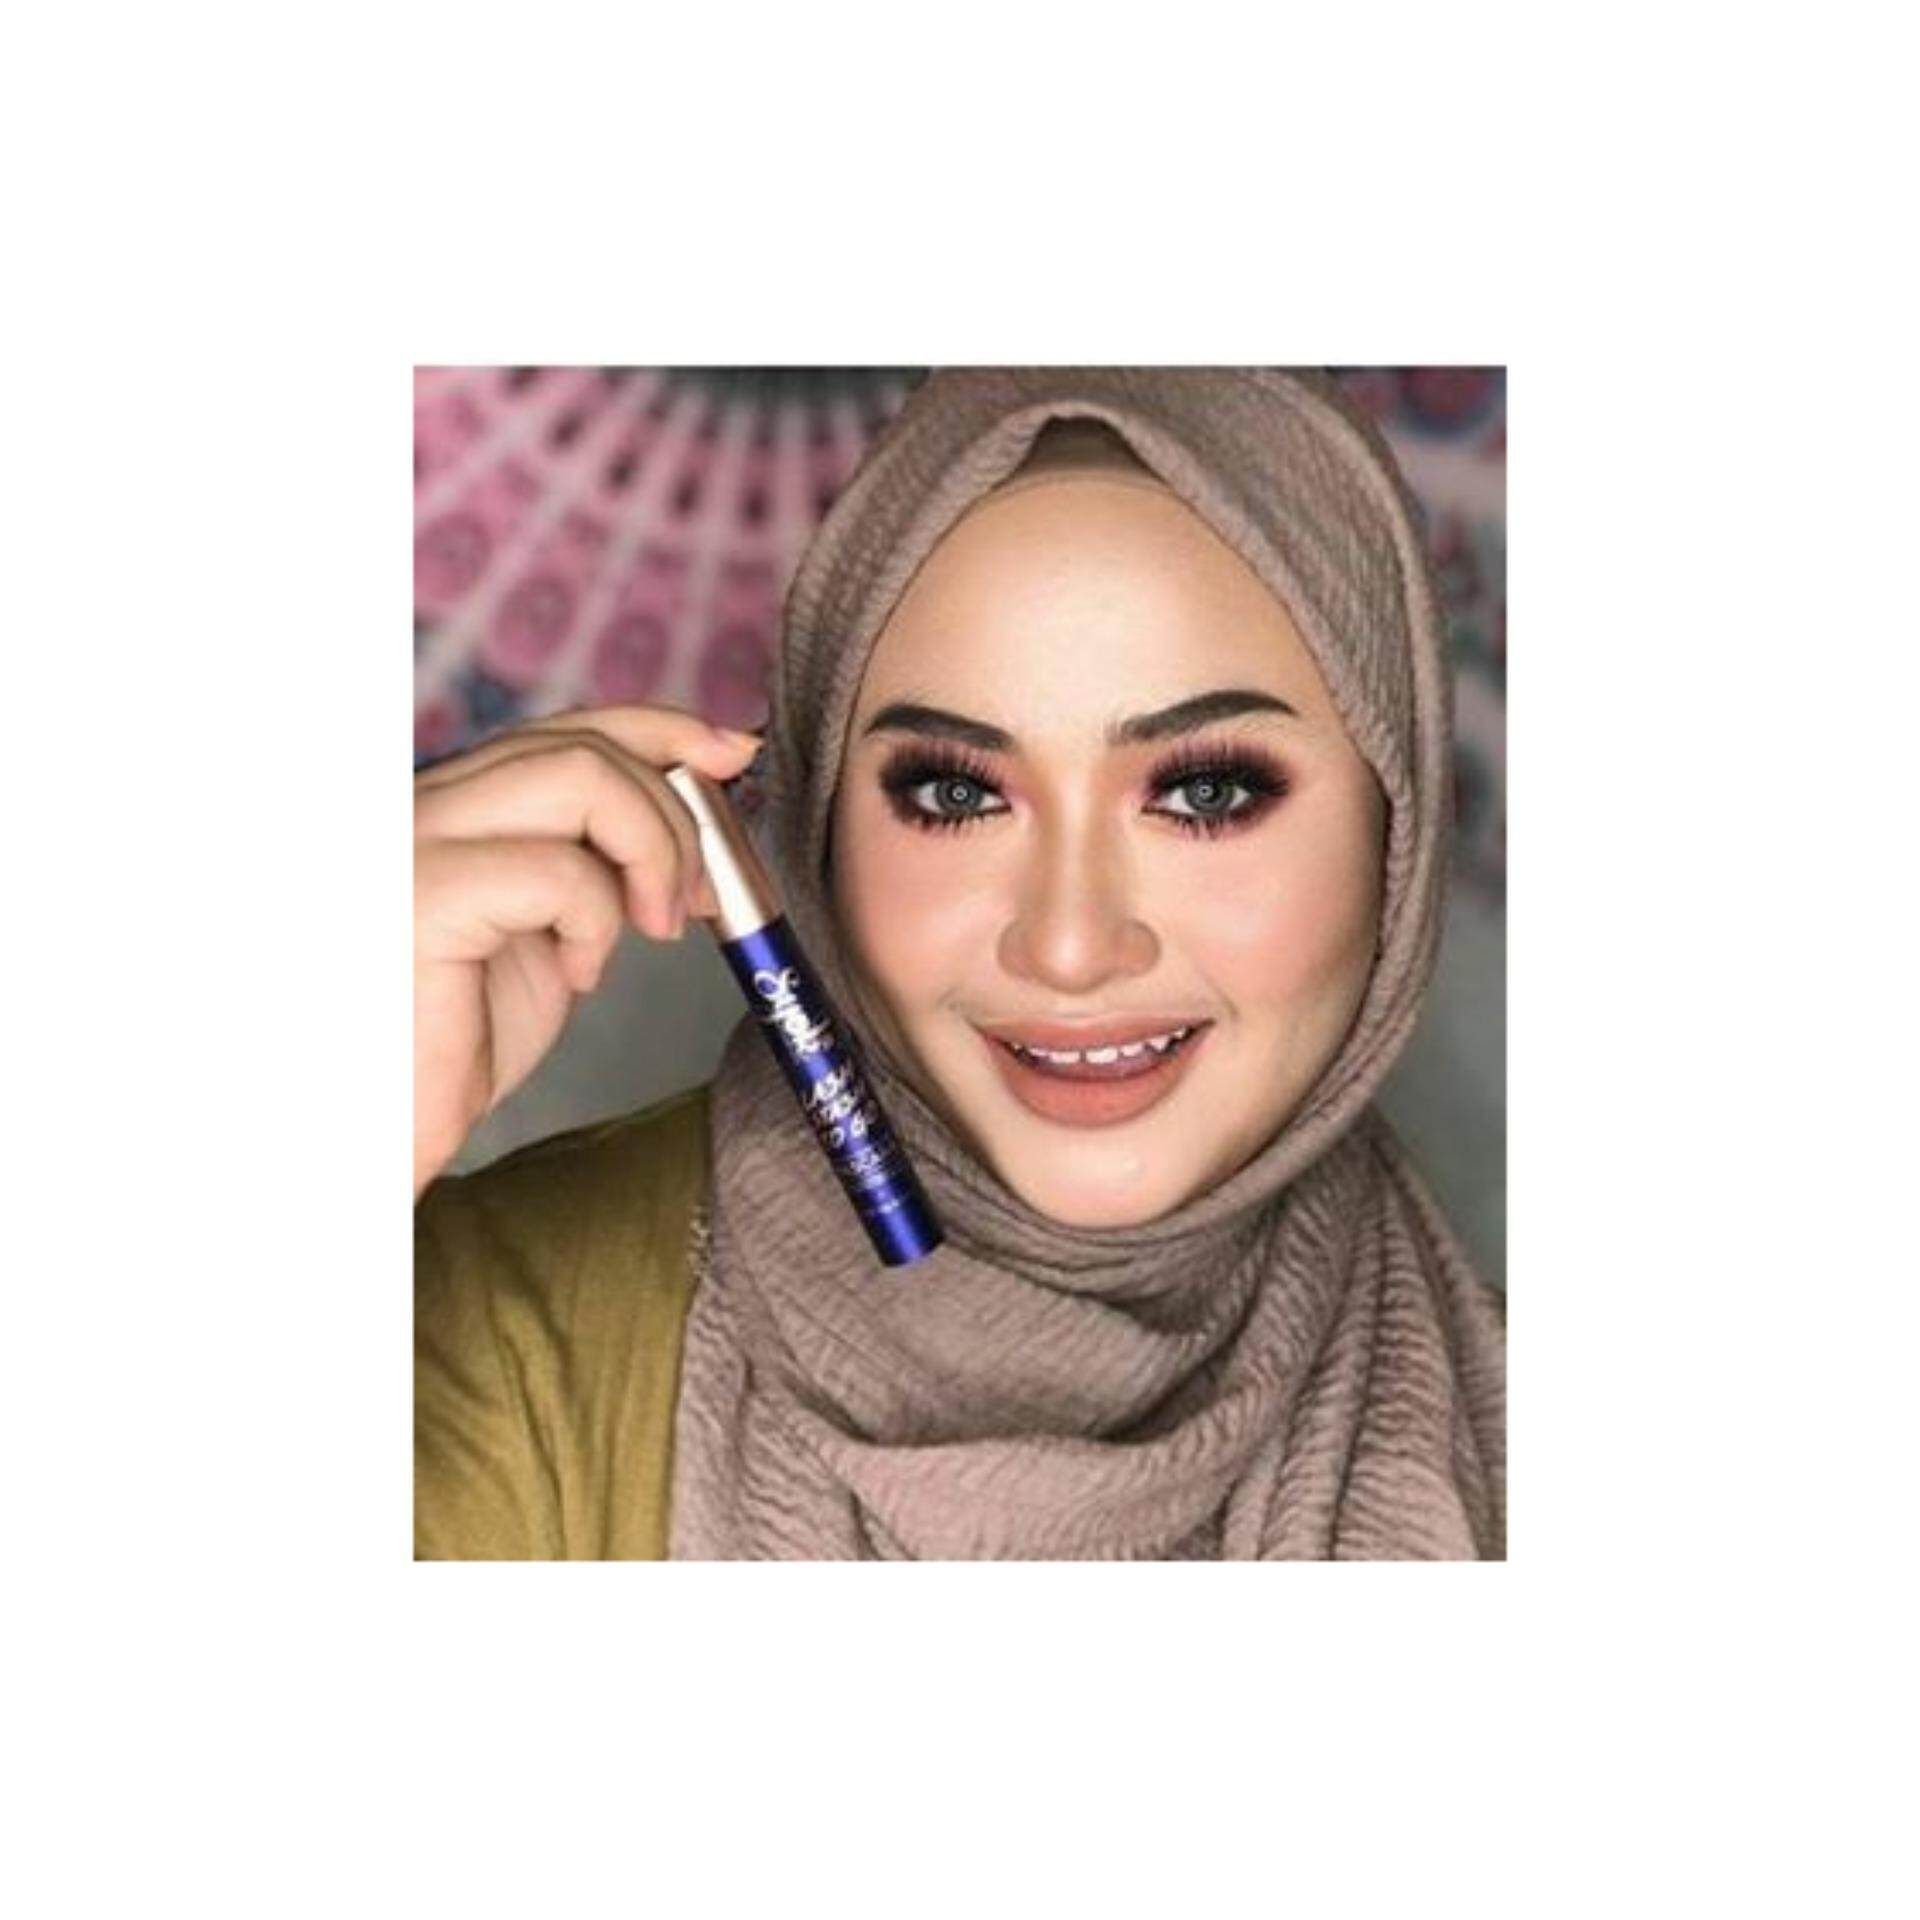 Ratu Mas Lulur Sinangling Daftar Harga Terbaru Indonesia Rm 25 Gr Syok Mascara